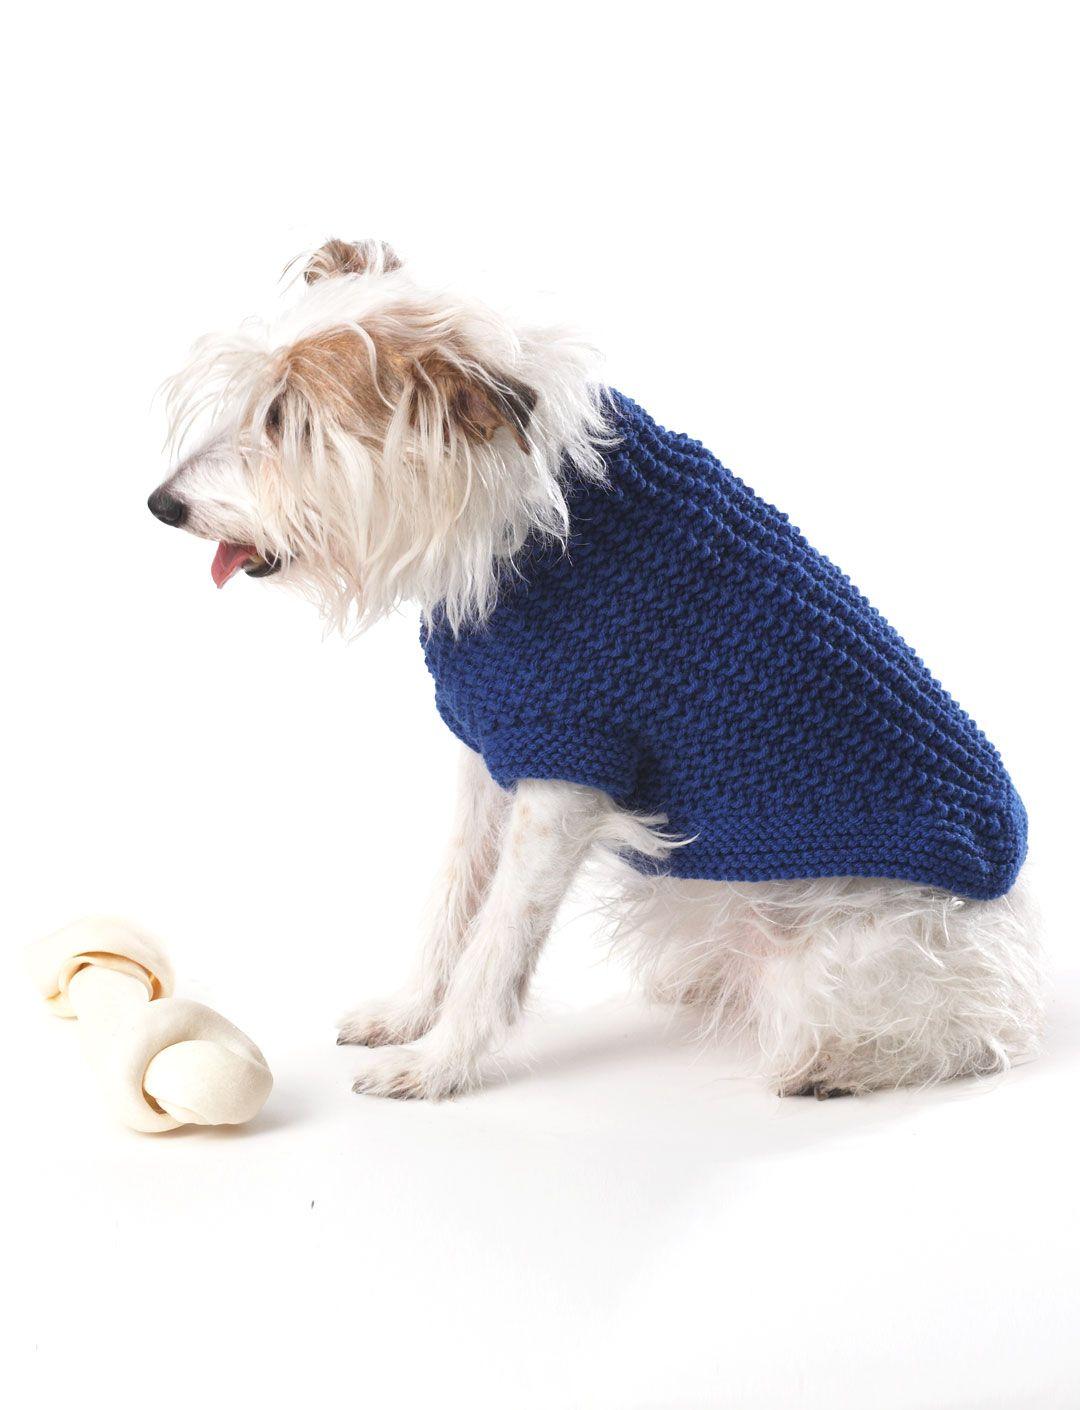 Knit Dog Coat | Yarn | Free Knitting Patterns | Crochet Patterns ...